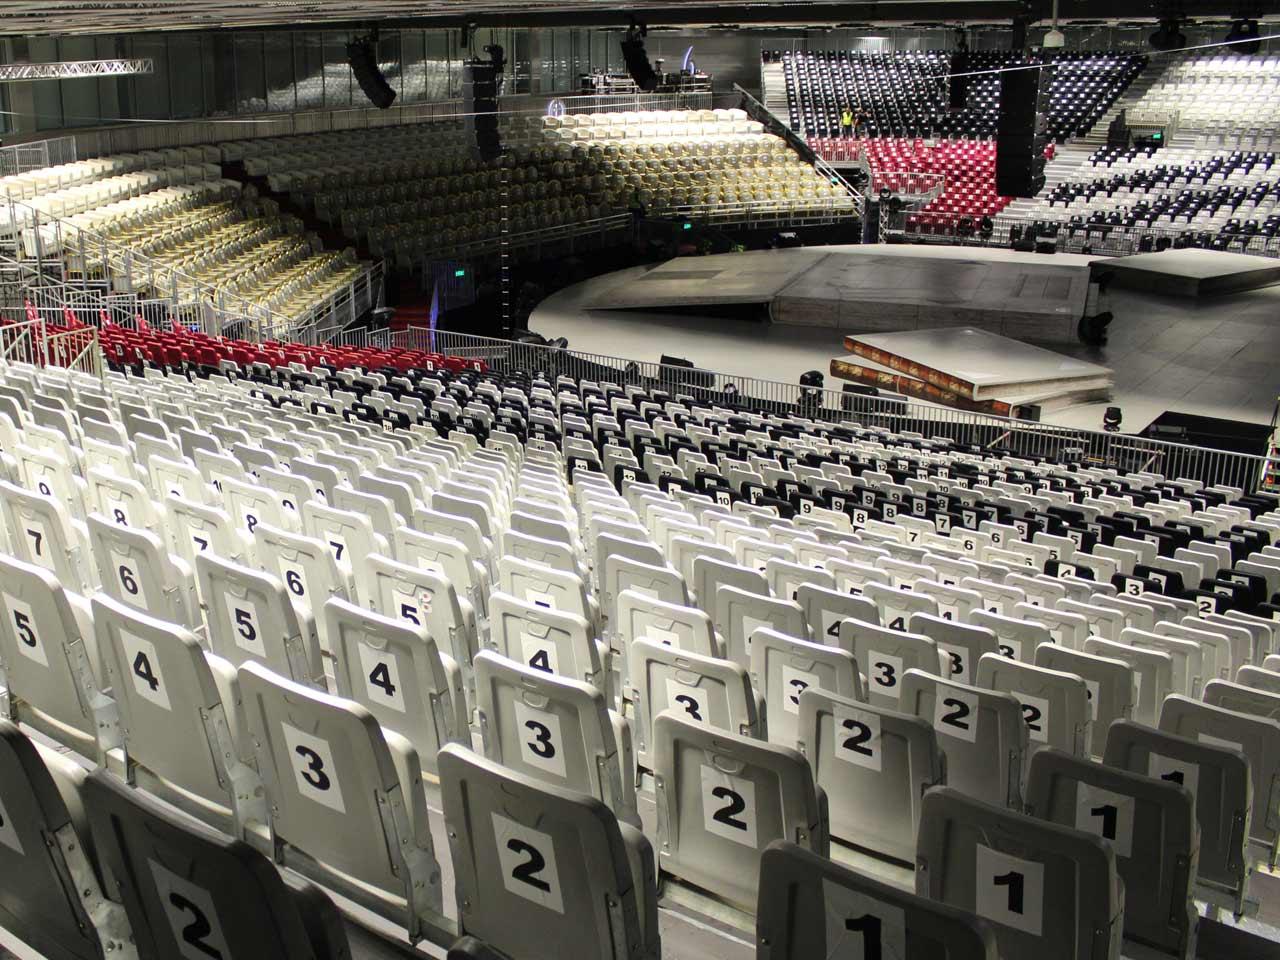 grandstand-seats-events-setup-rental-stadium-seating-sport-management-film-festival-seating-screening-f1-open-air-cinema-14